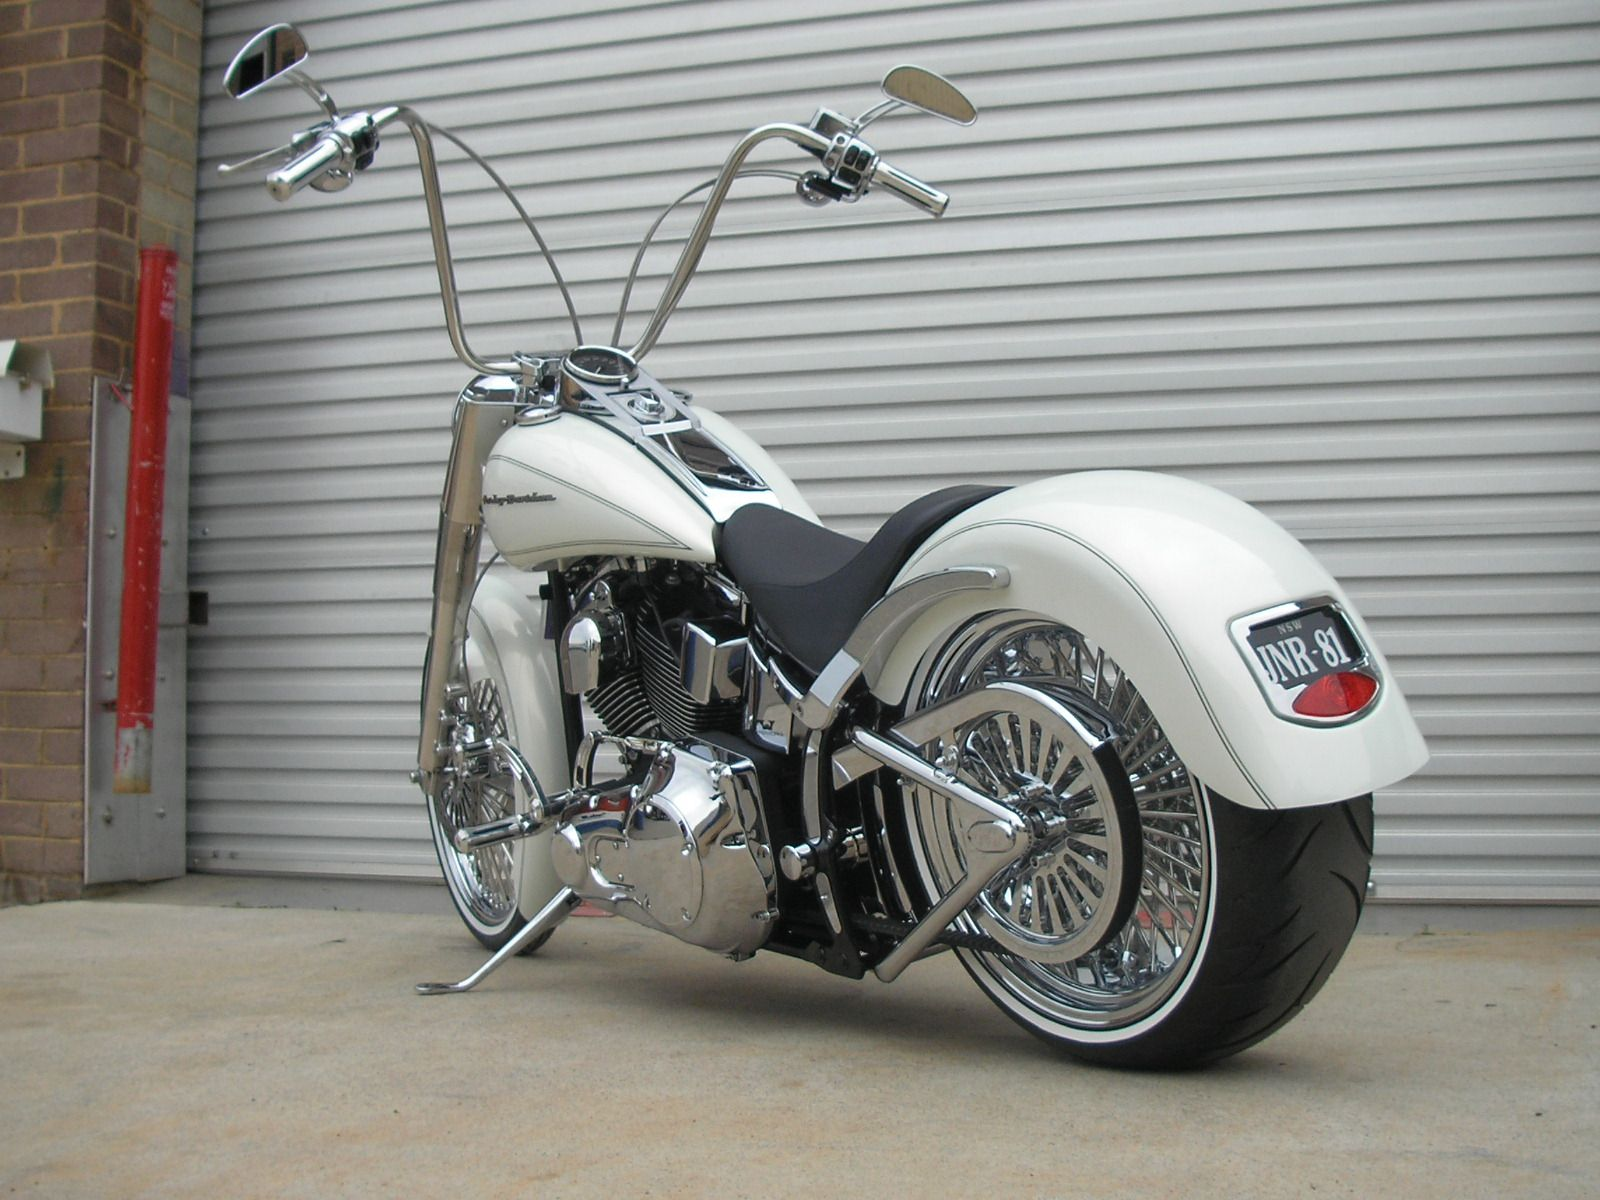 Lowrider harley custom lowrider bikes chopper harley - Old school harley davidson wallpaper ...